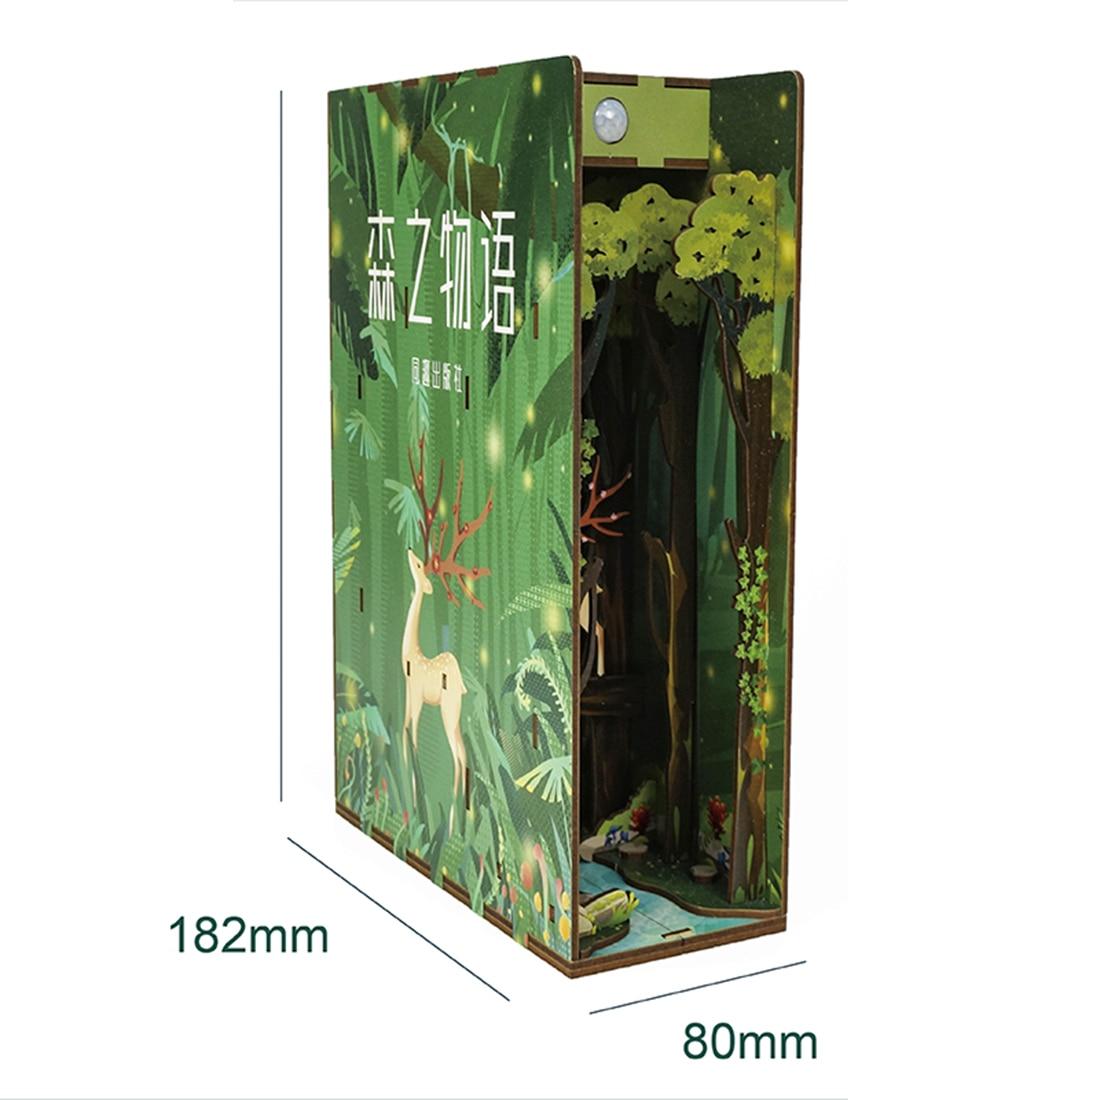 Hc9953661a5fa4971a46e4686dcbb03a8n - Robotime - DIY Models, DIY Miniature Houses, 3d Wooden Puzzle